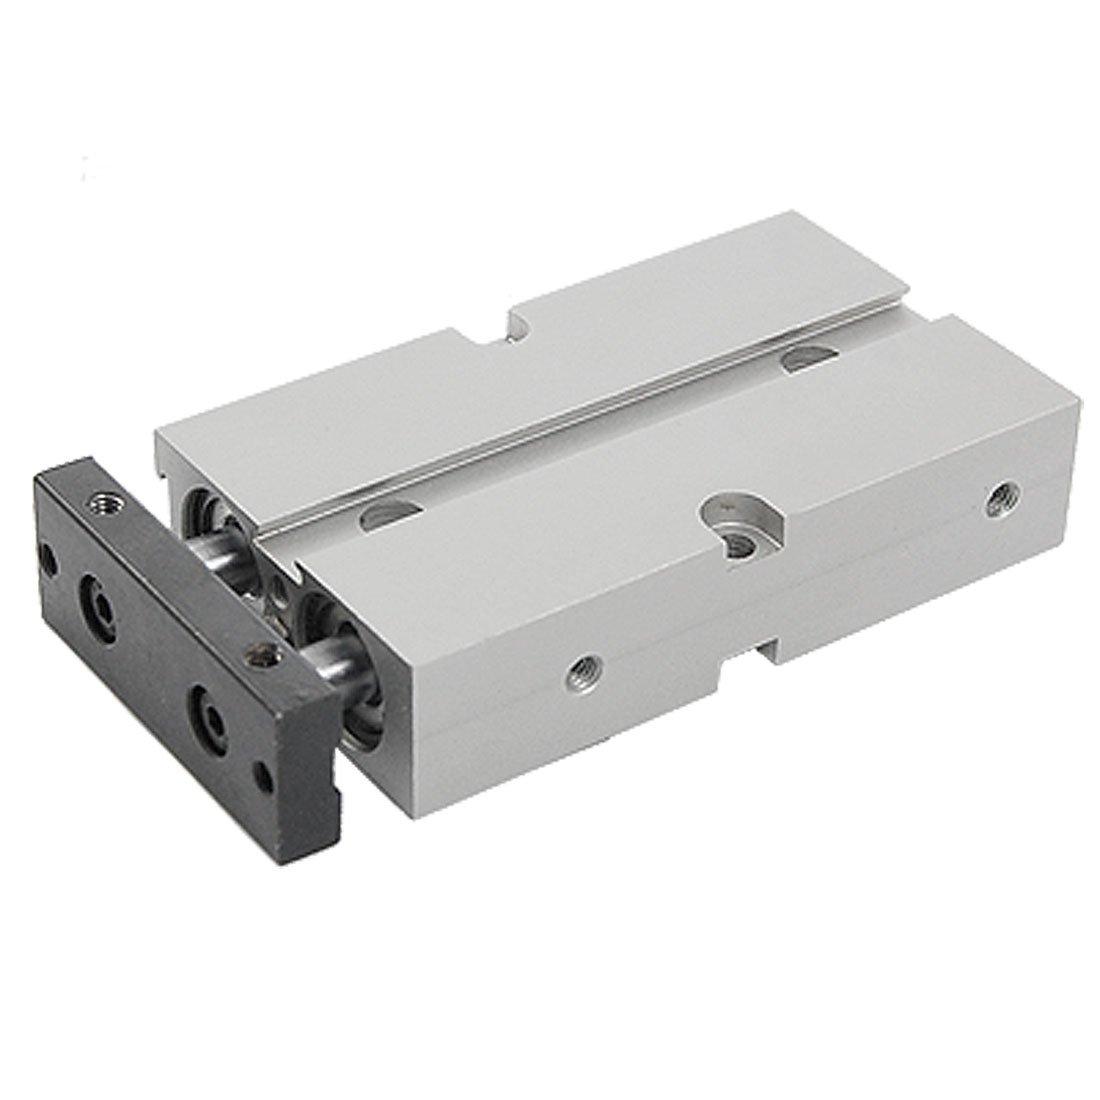 Sourcingmap Luft Doppel Corsa TN 16 –  40 16 mm Hebel 40 millimeter Zylinder a11070800ux0240